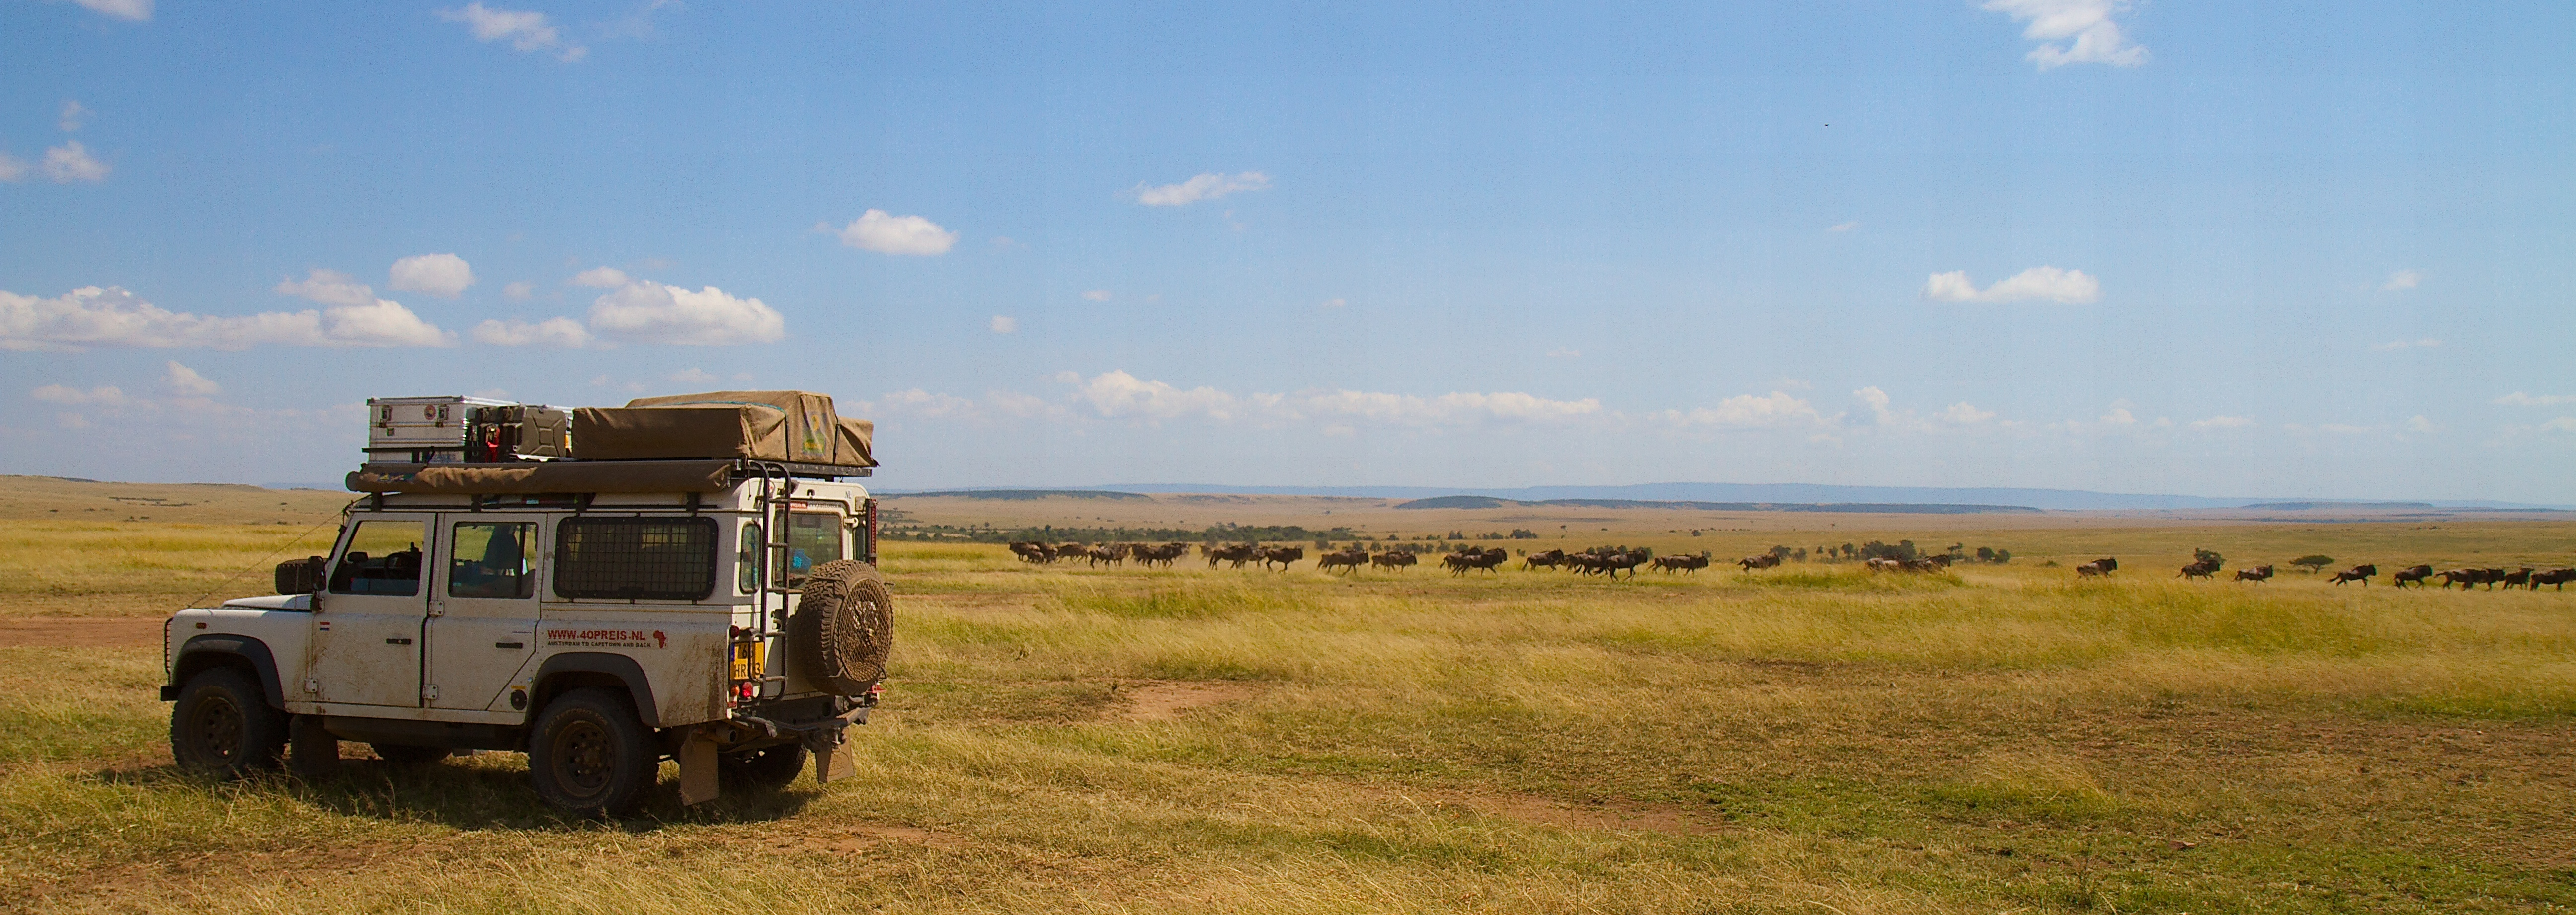 Kenya, Masai Mara, Wildebeasts